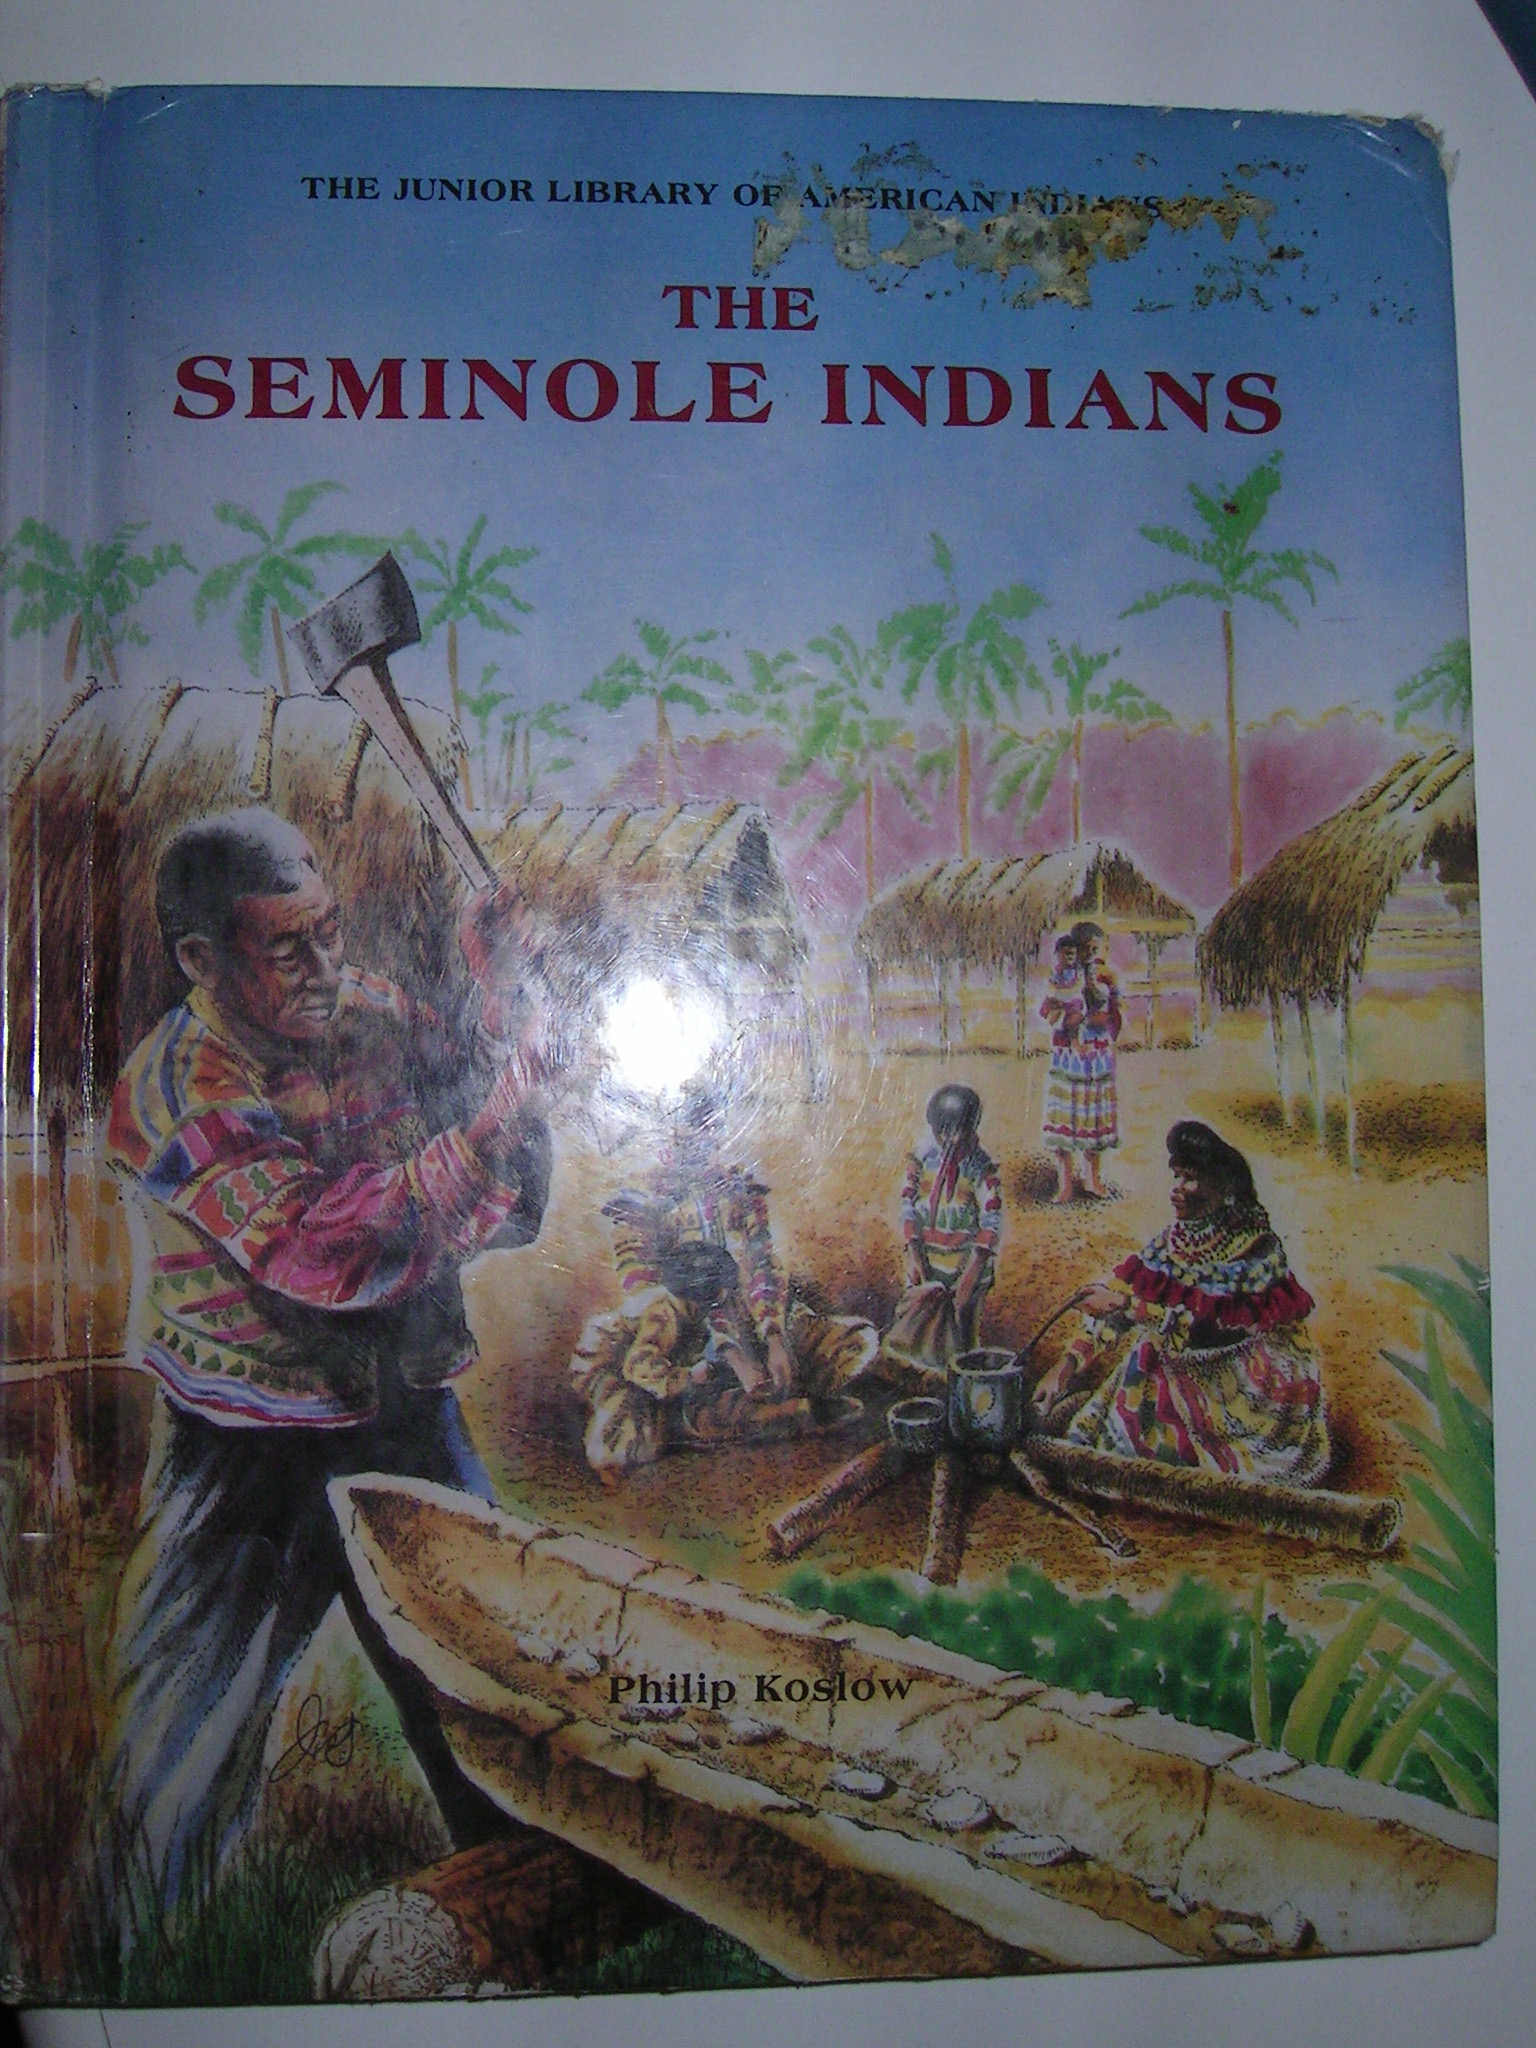 The Seminole Indians